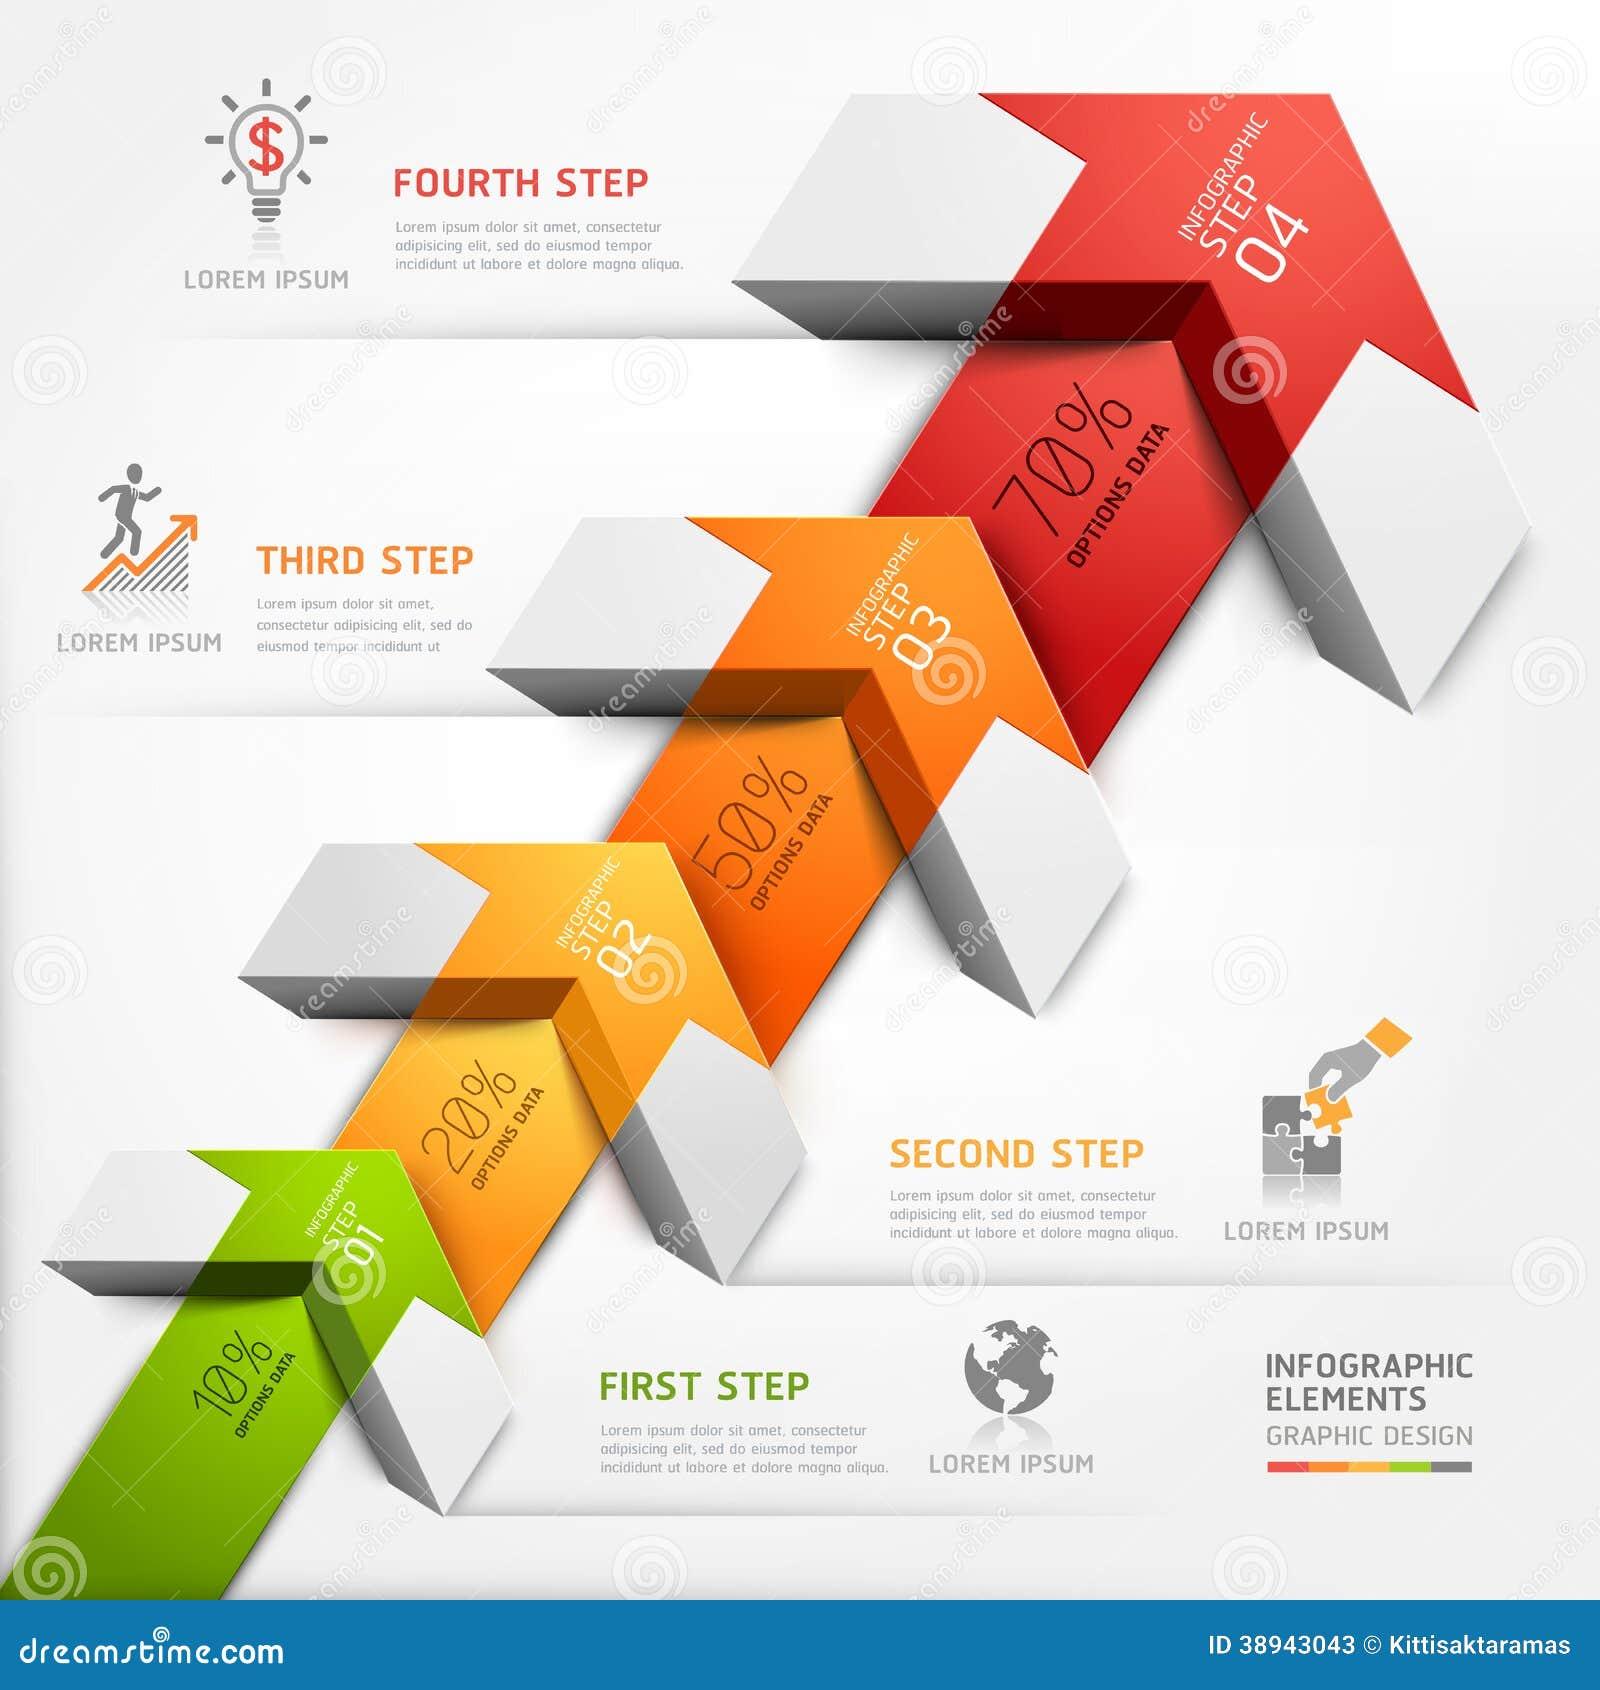 3d intensifican negocio del diagrama de la escalera de la flecha.